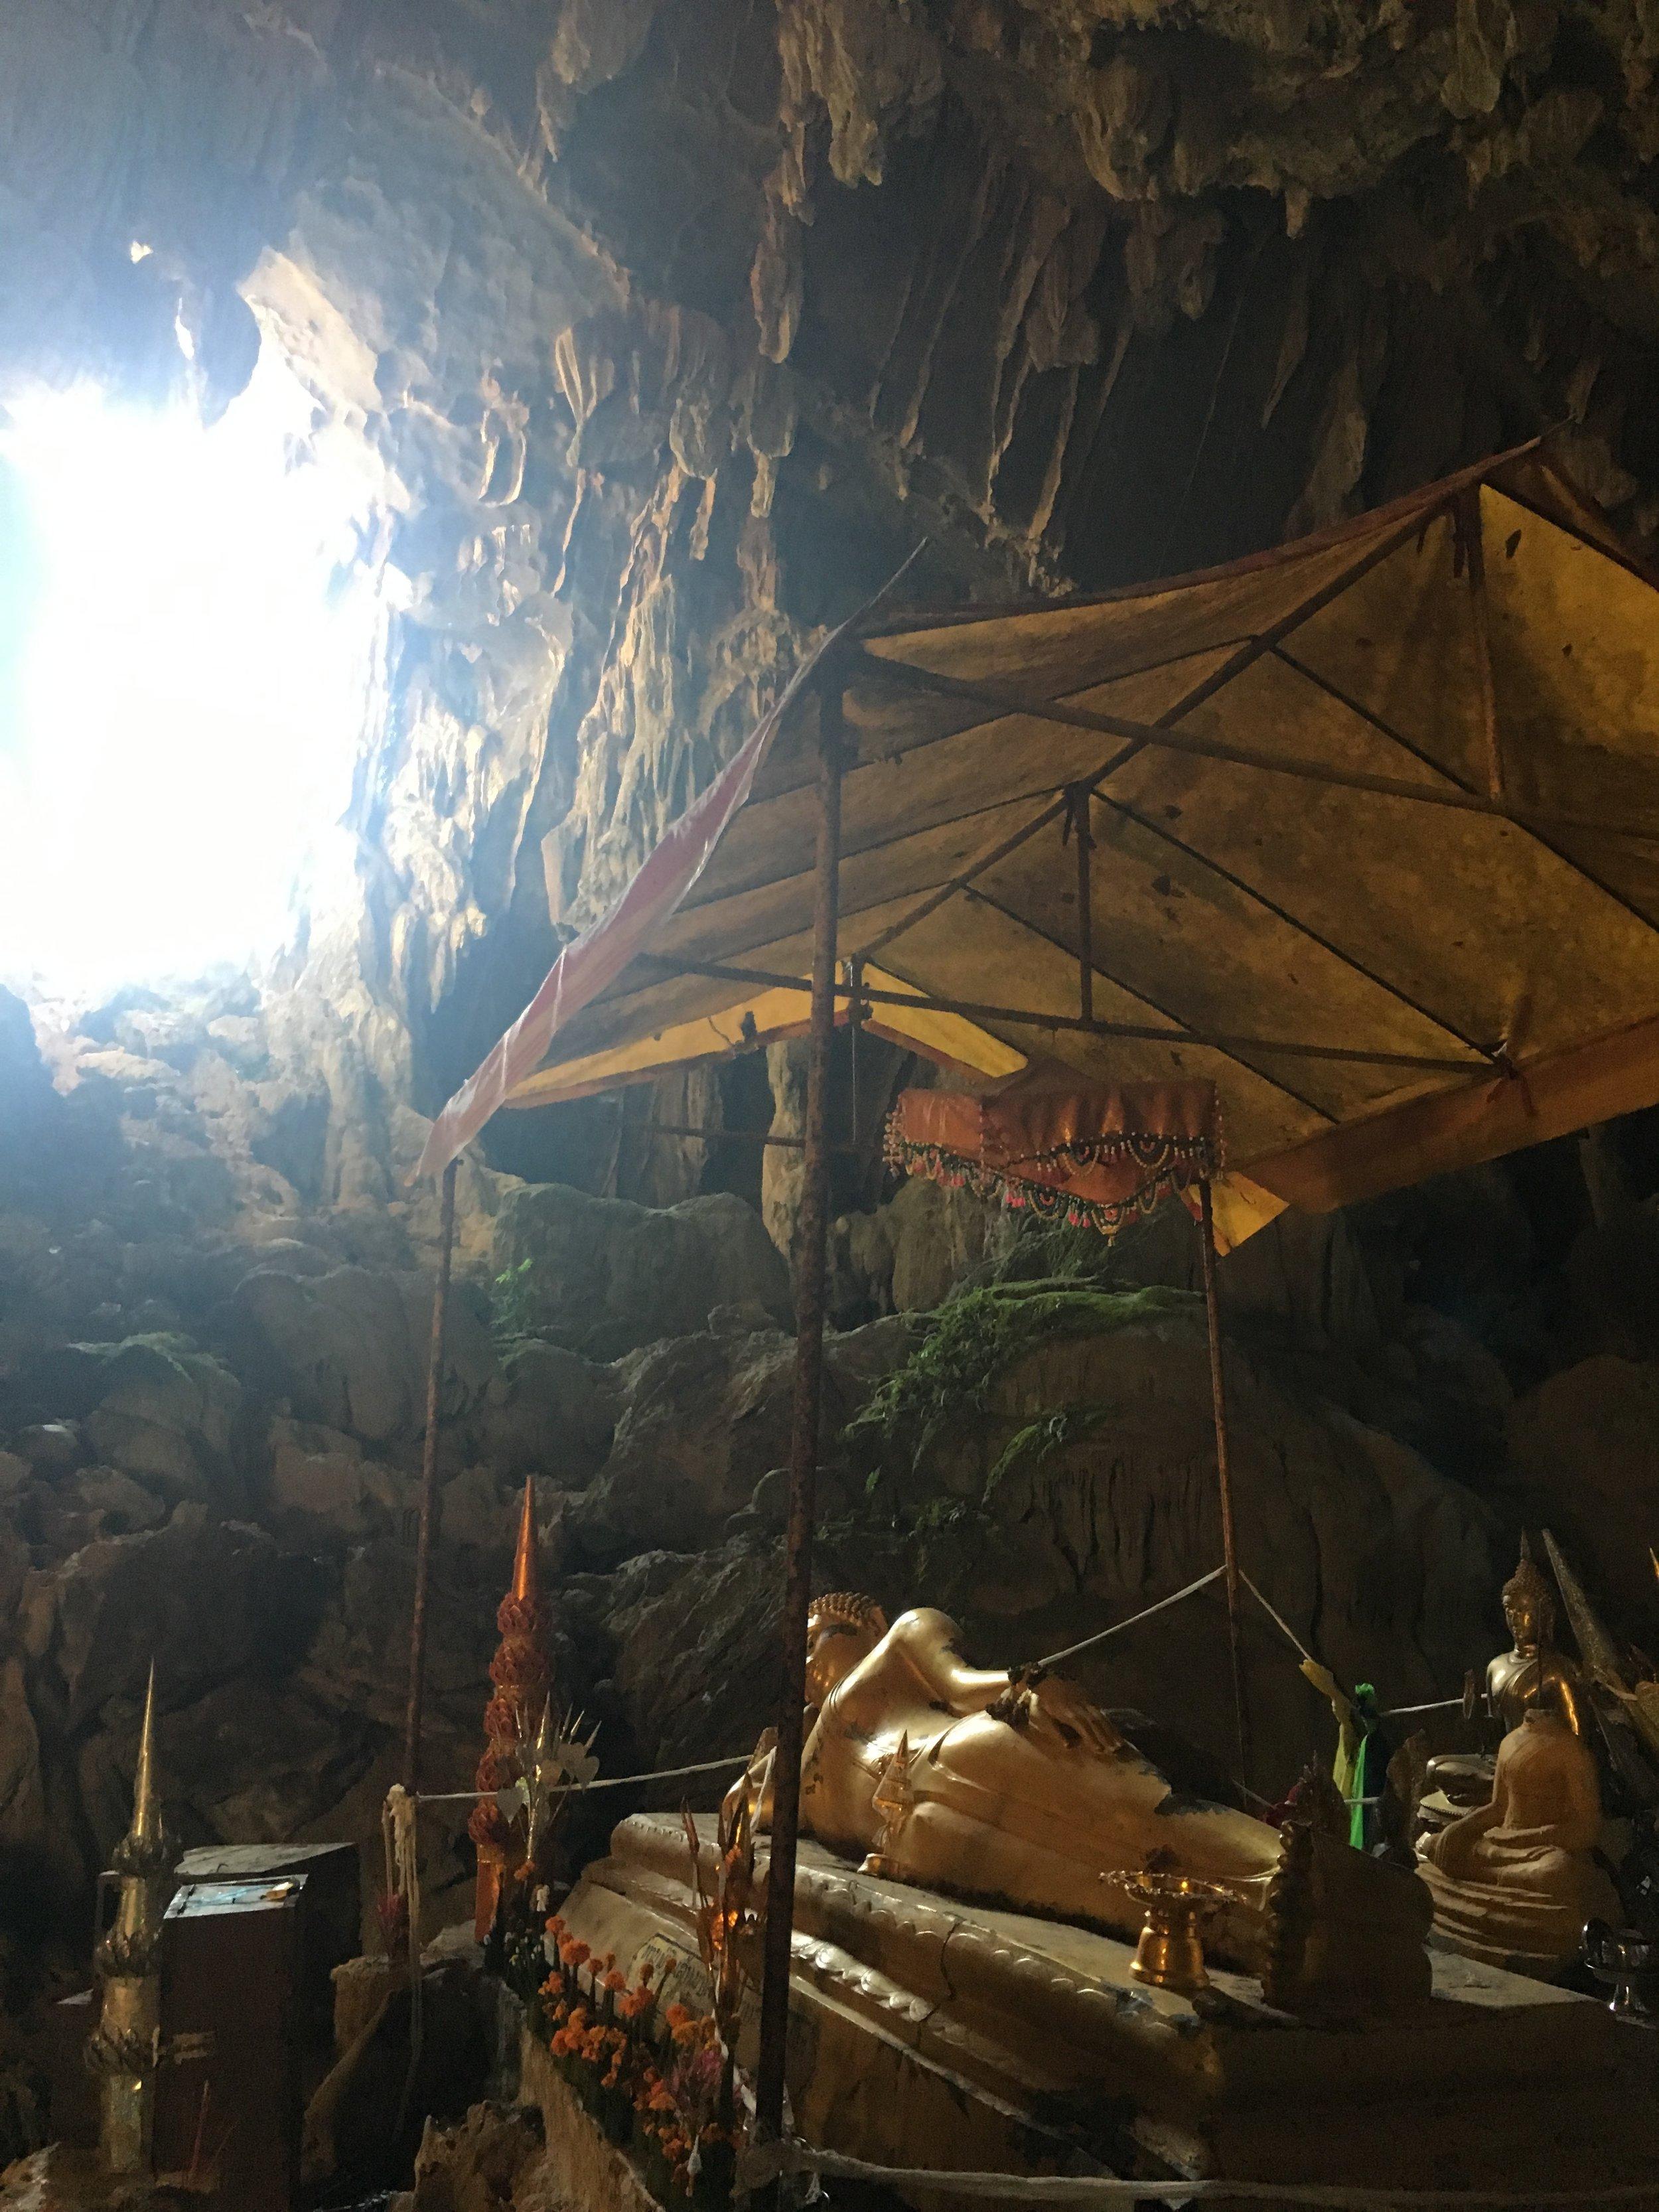 The impressive Tham Phu Kam caves at Blue Lagoon. Incredible